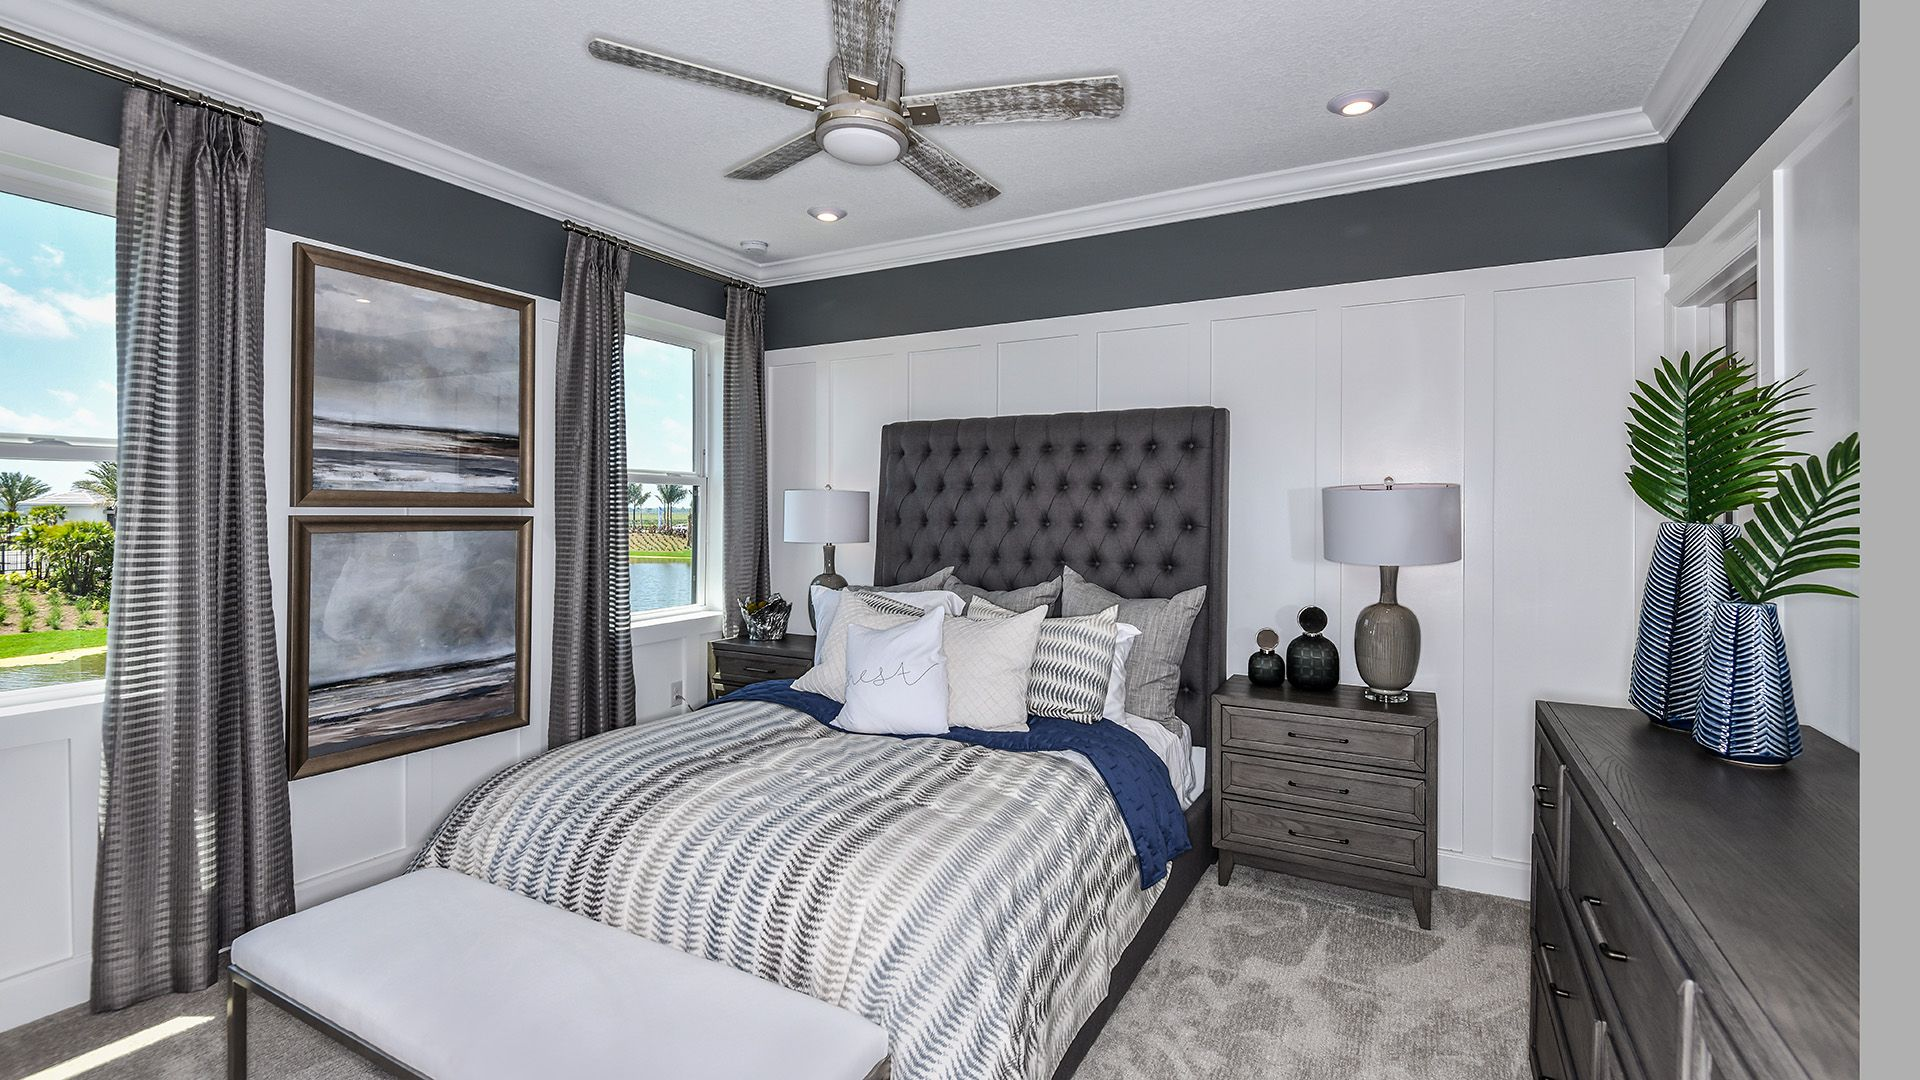 Bedroom featured in the Anastasia By Taylor Morrison in Sarasota-Bradenton, FL